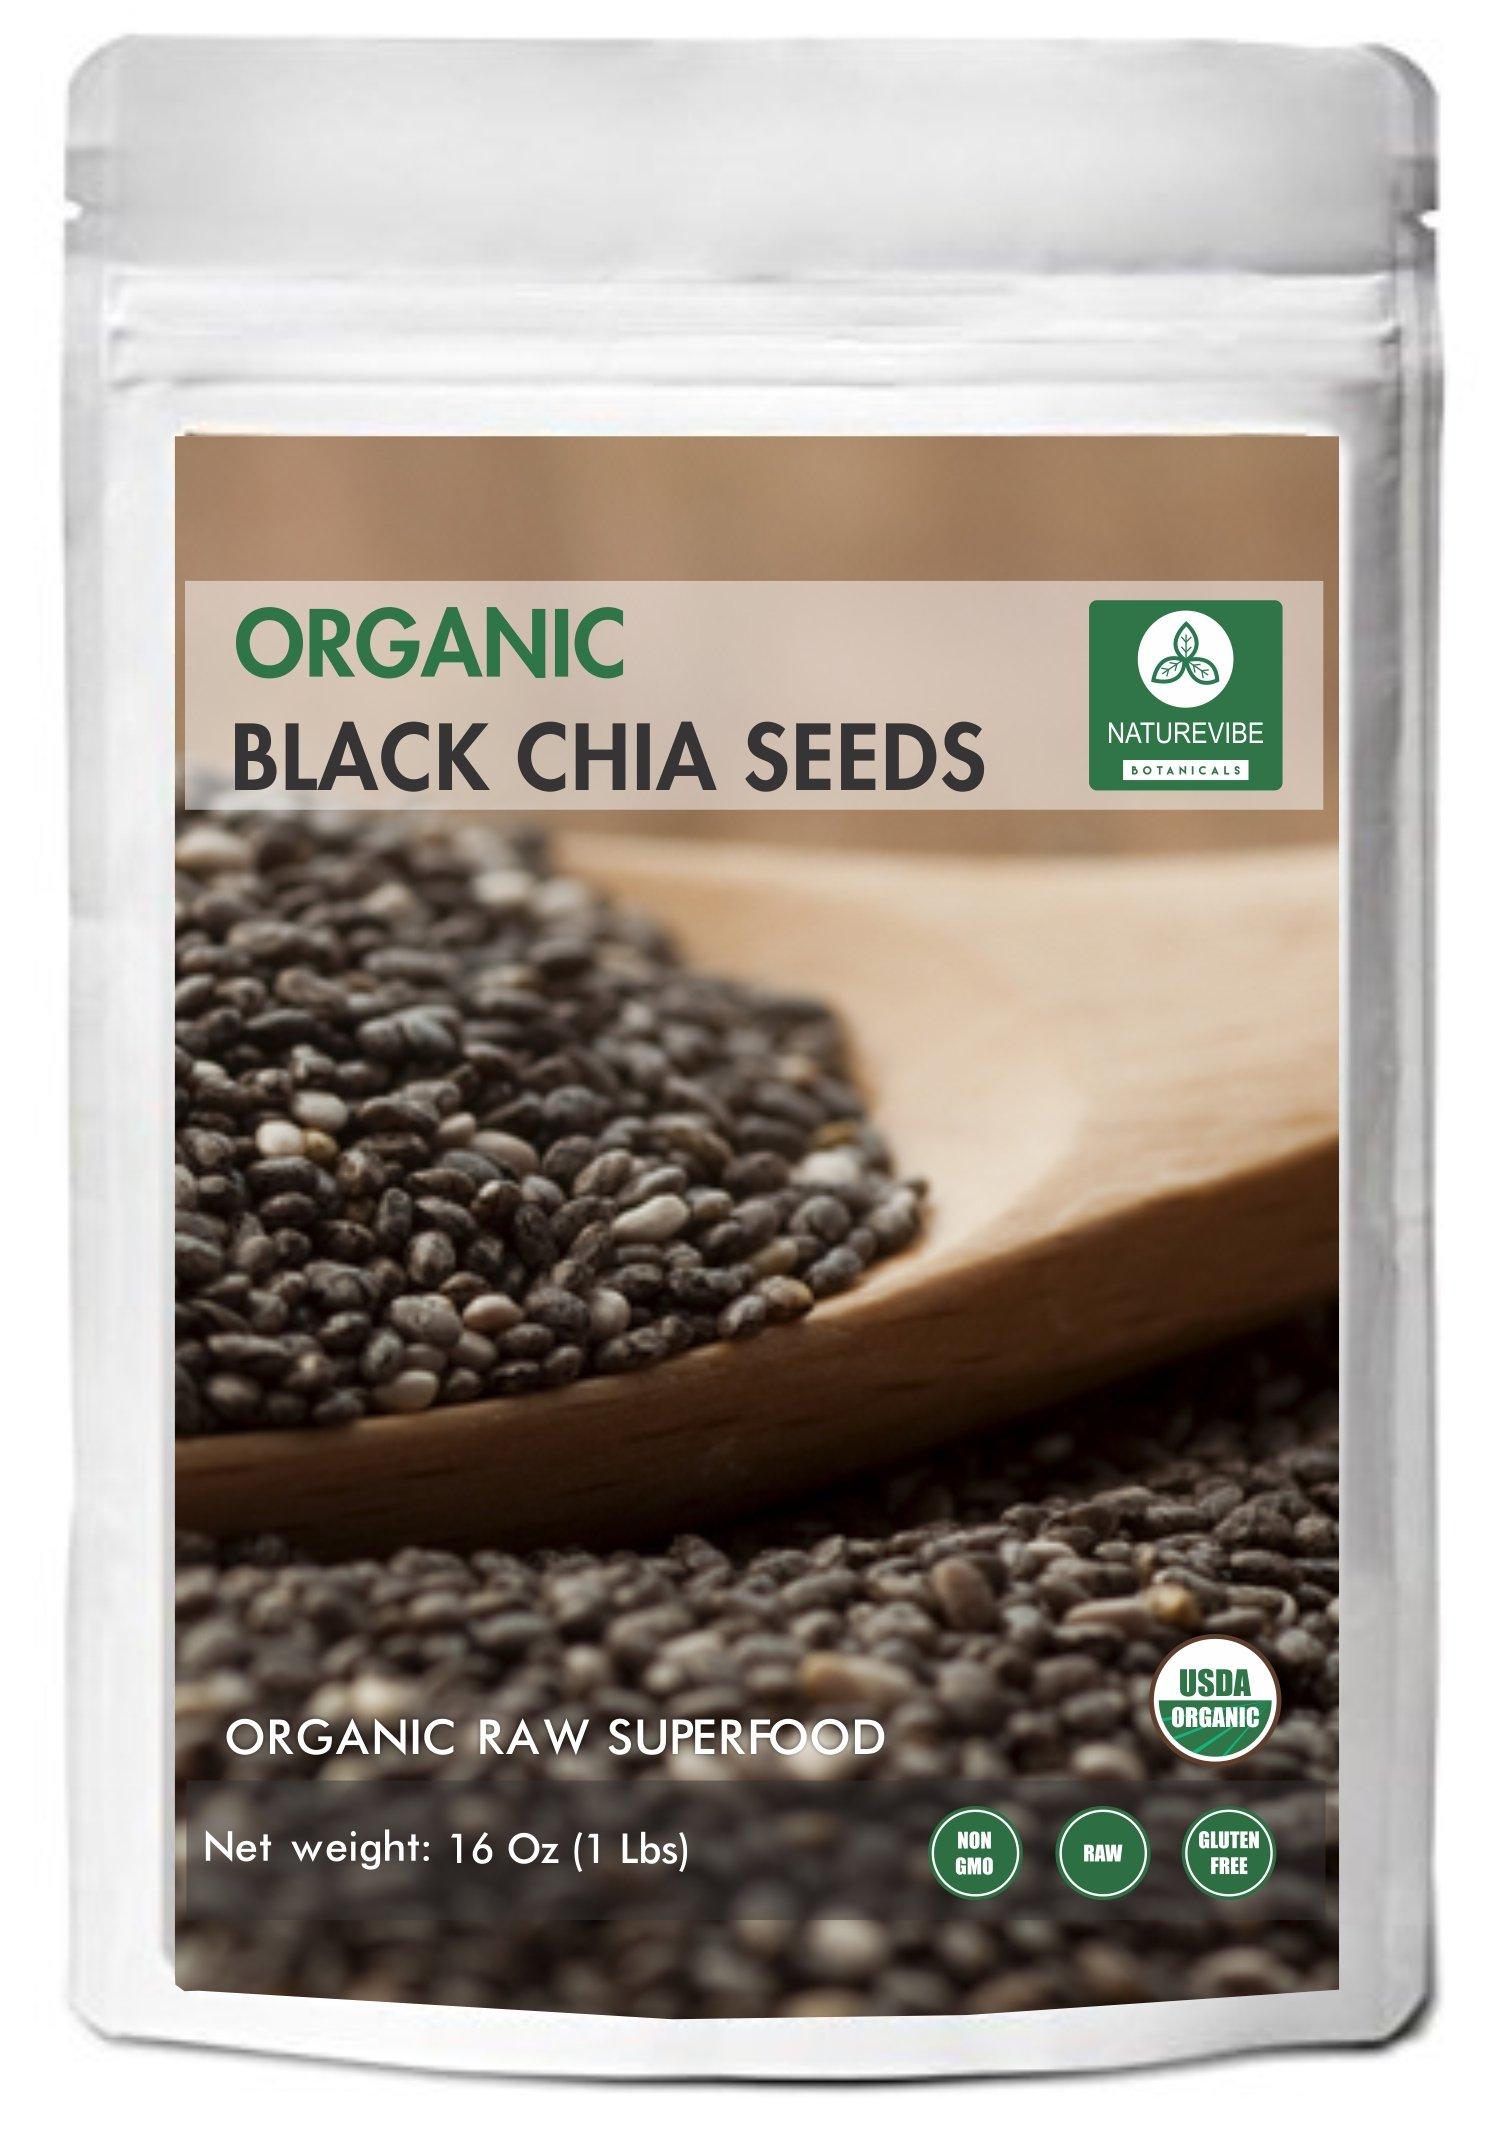 Organic Black Chia Seeds (1lb) by Naturevibe Botanicals, Gluten-Free & Non-GMO (16 ounces)